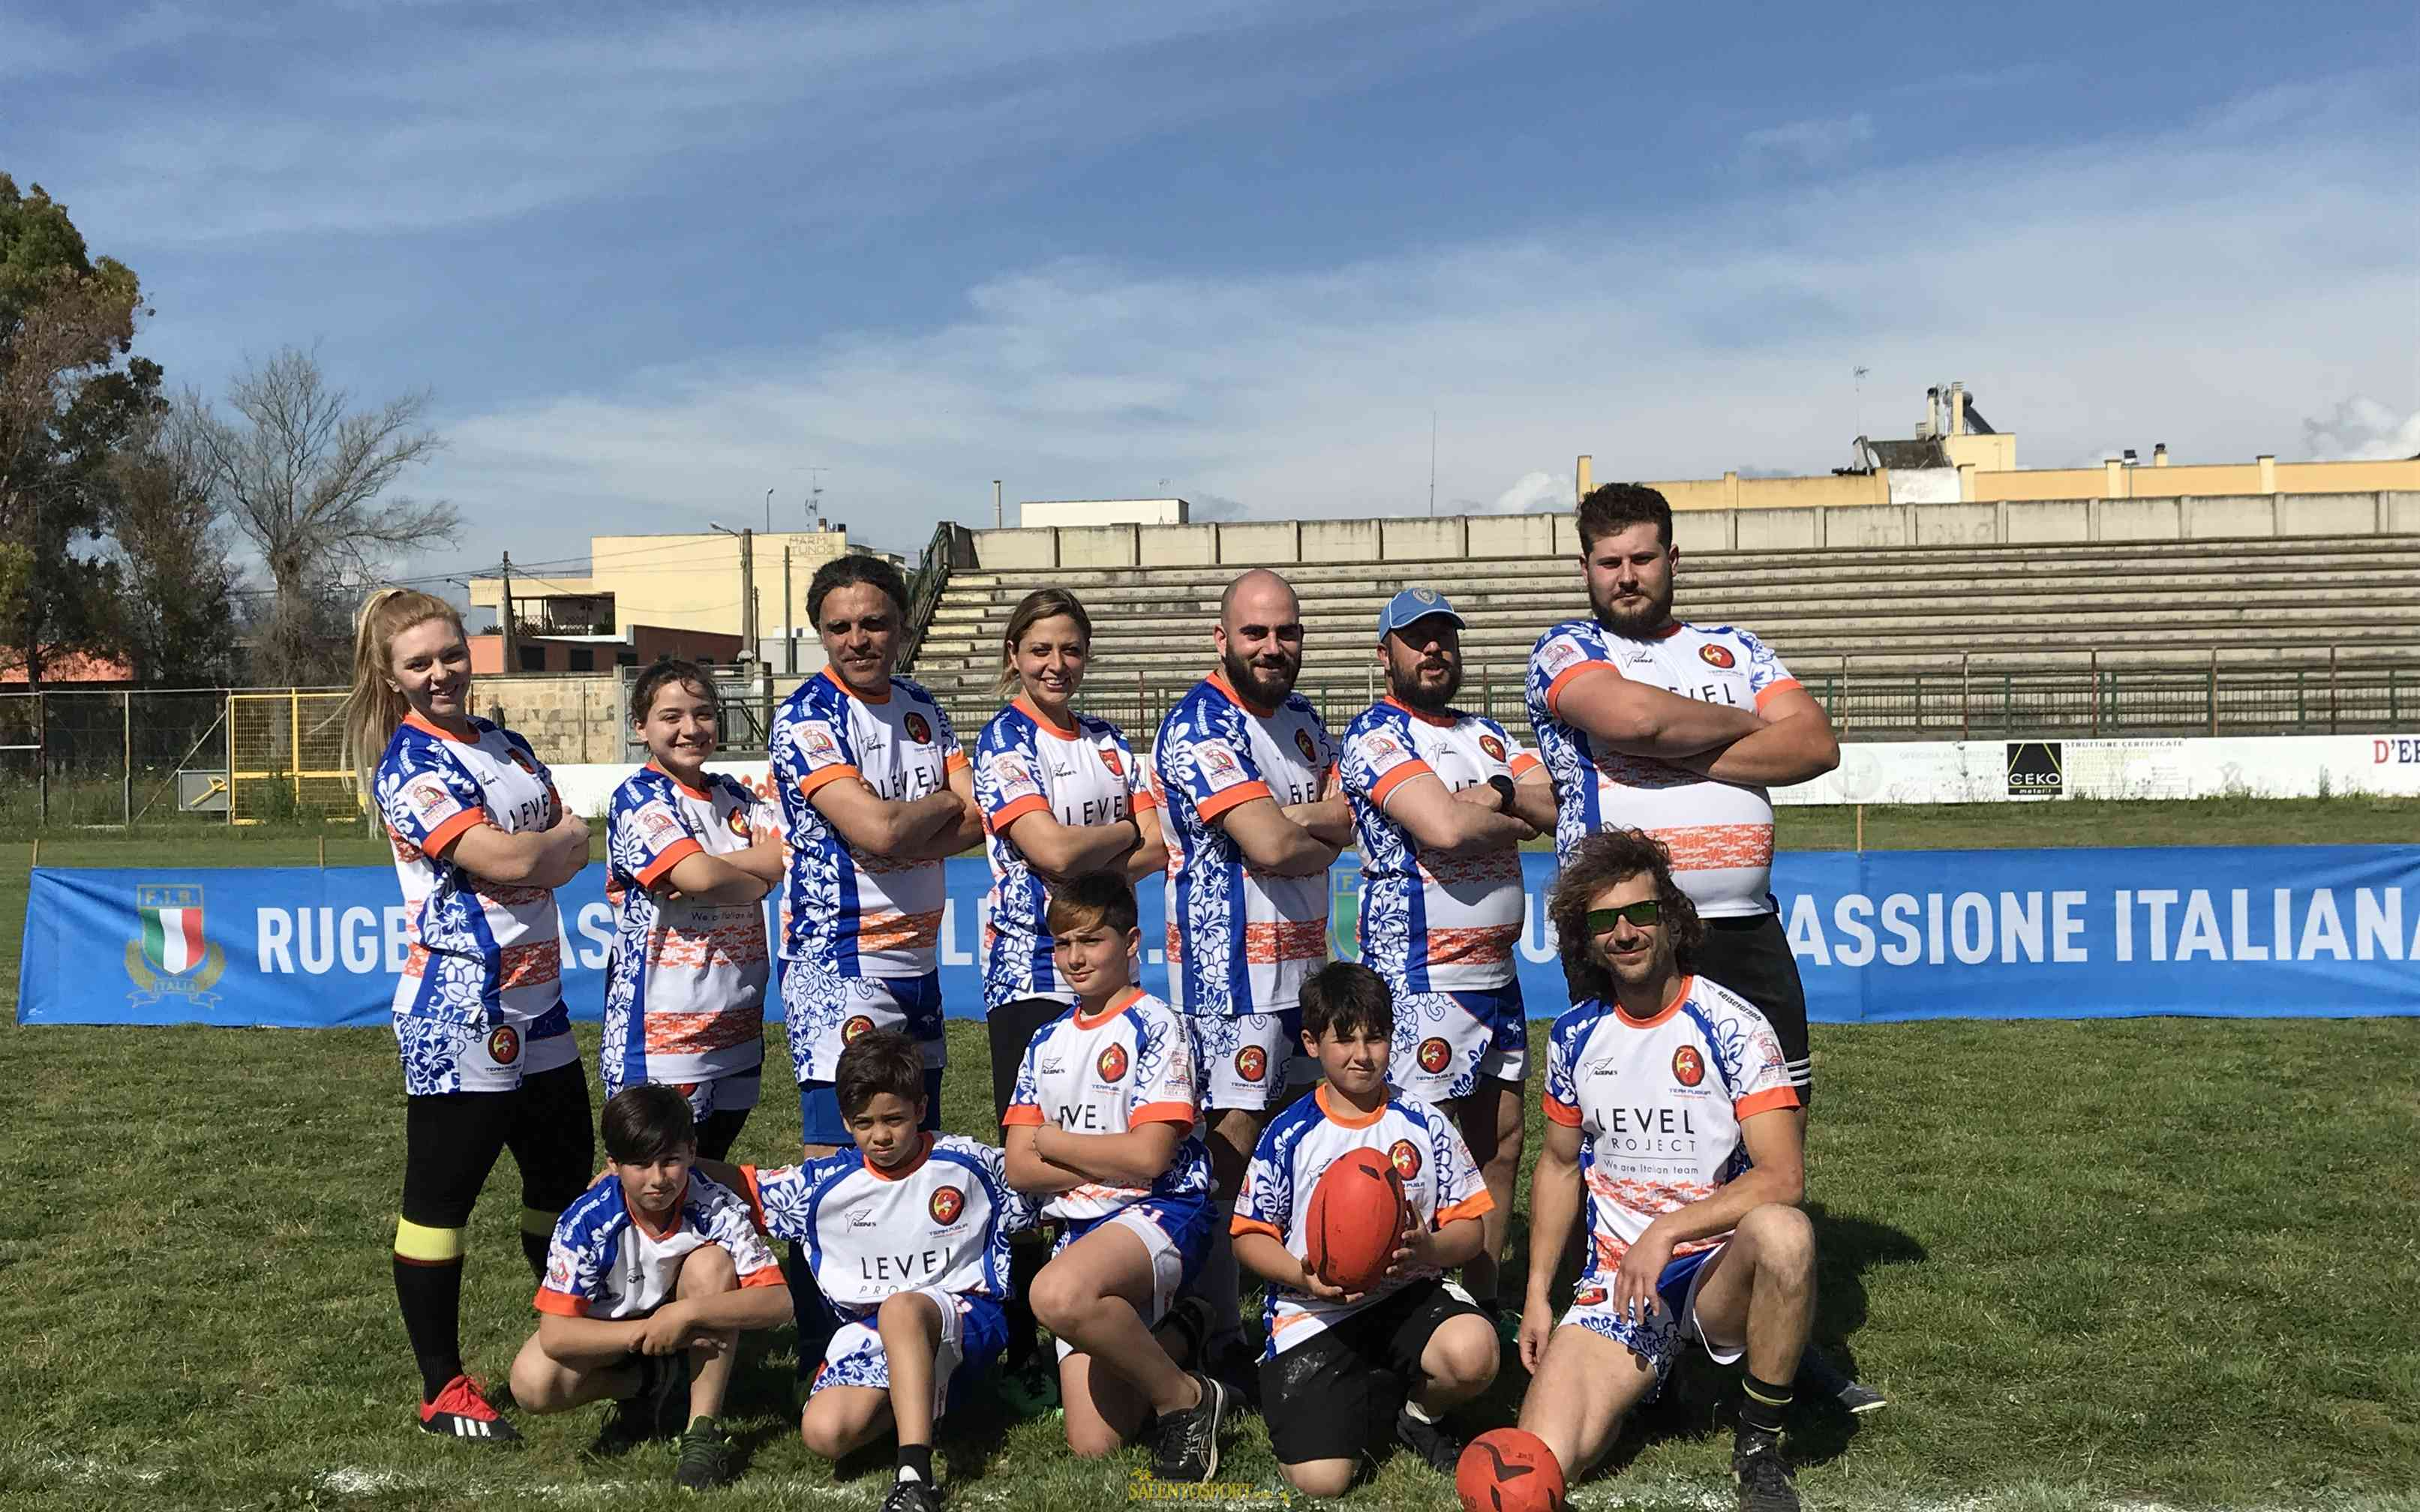 los-blancos-salentouch-rugby-tocco-mag-19